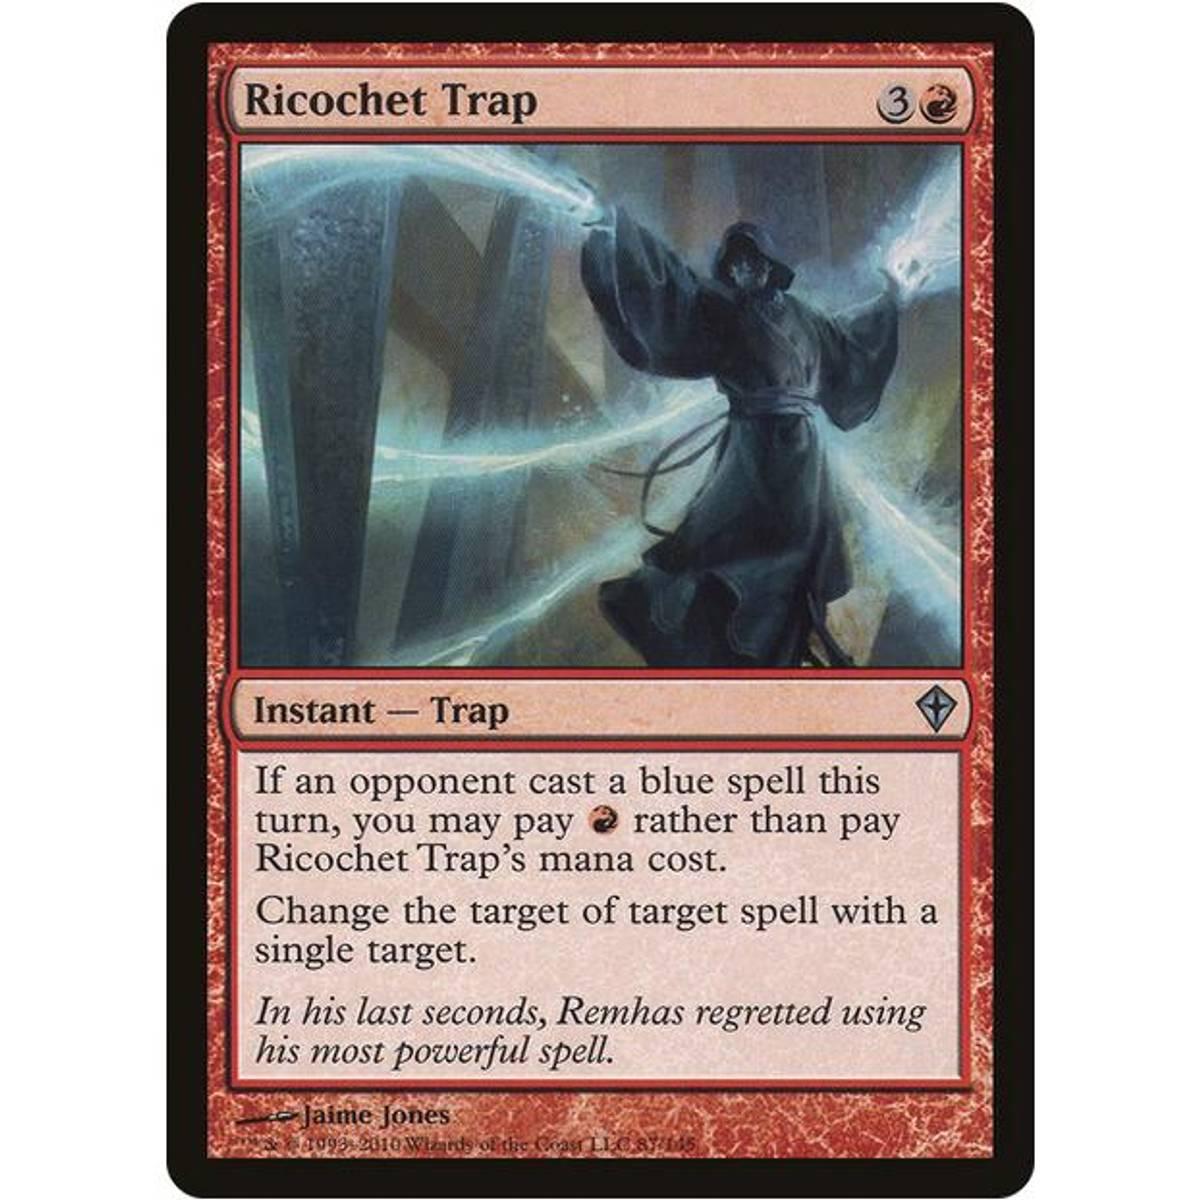 Ricochet Trap